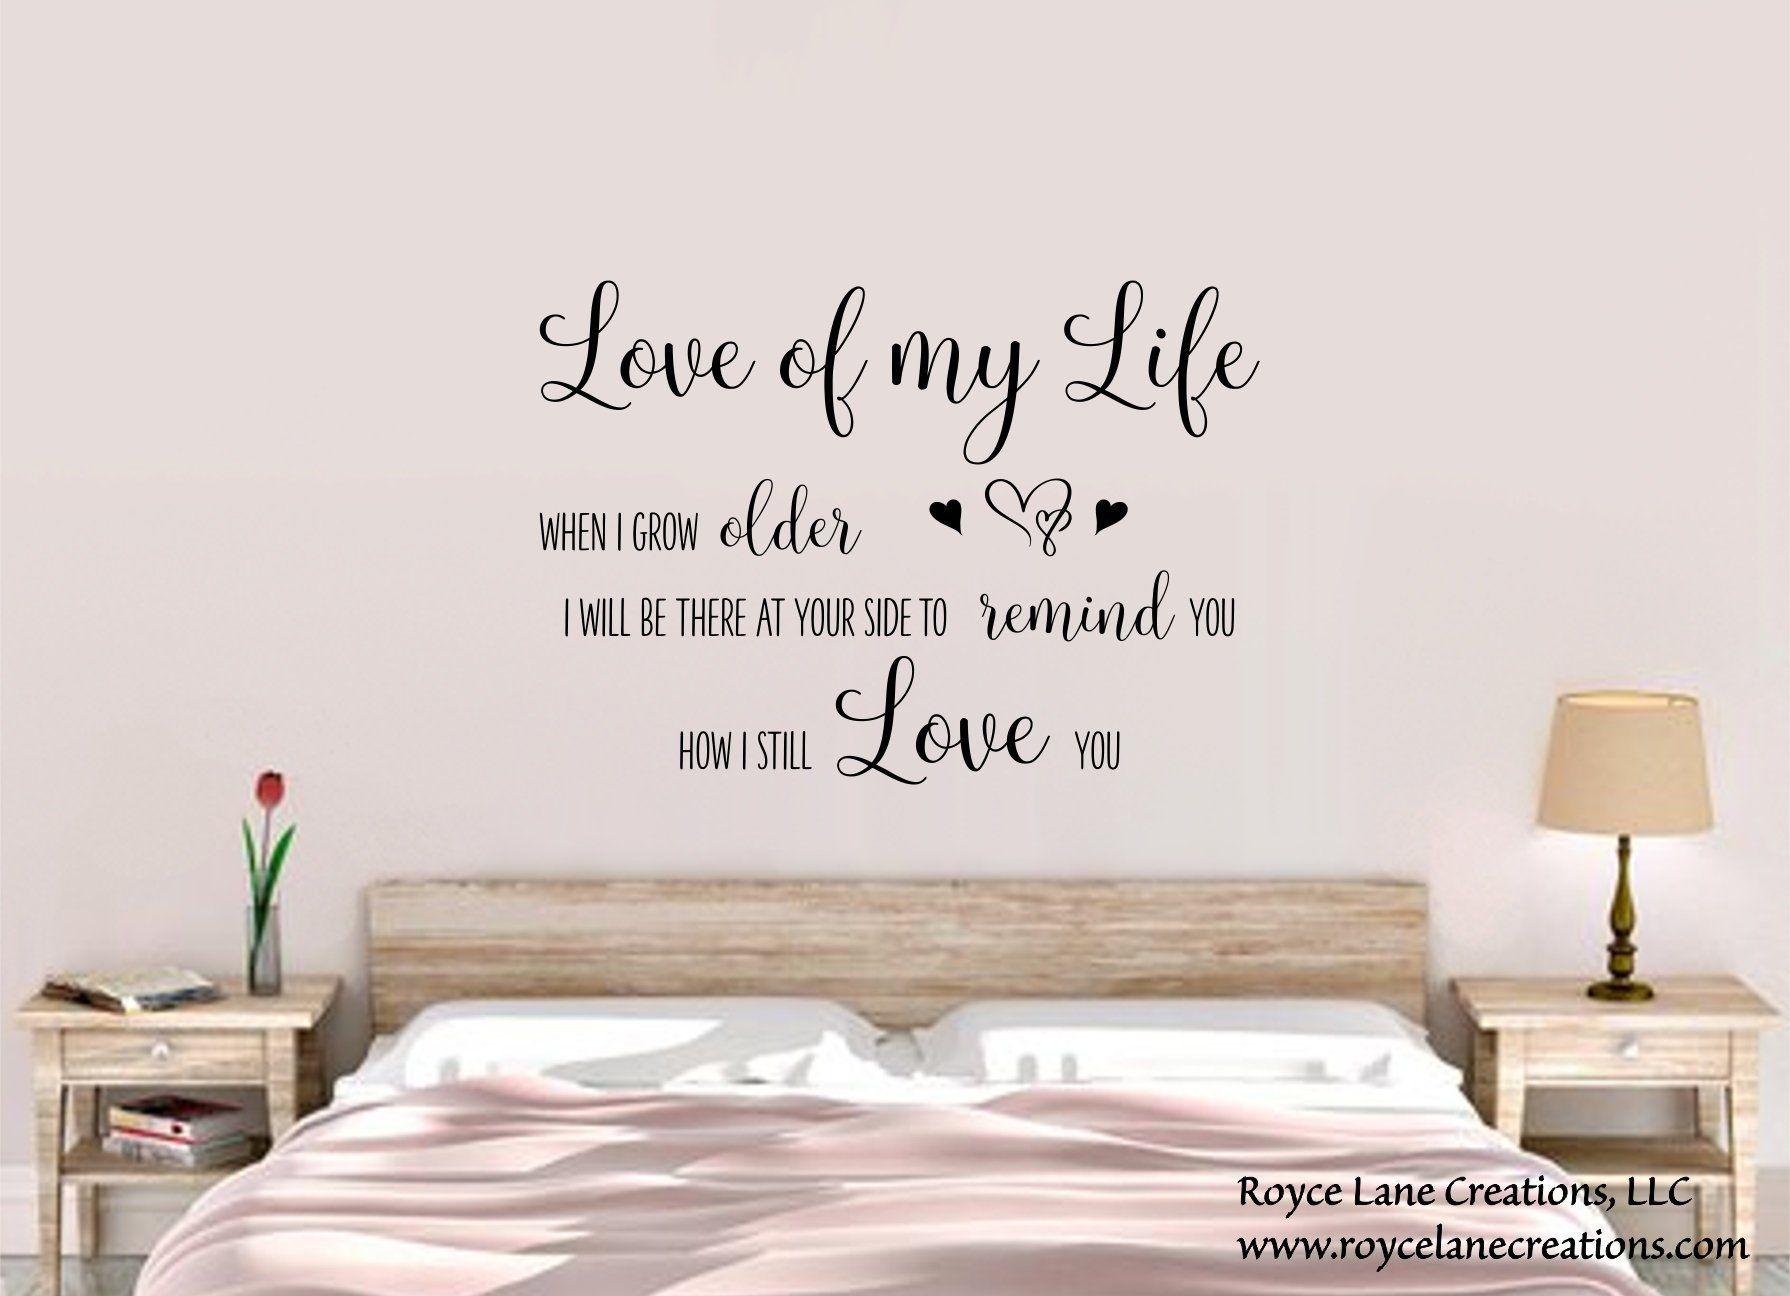 Love Of My Life Lyrics Bedroom Wall Decal Song Lyrics Wall Decal